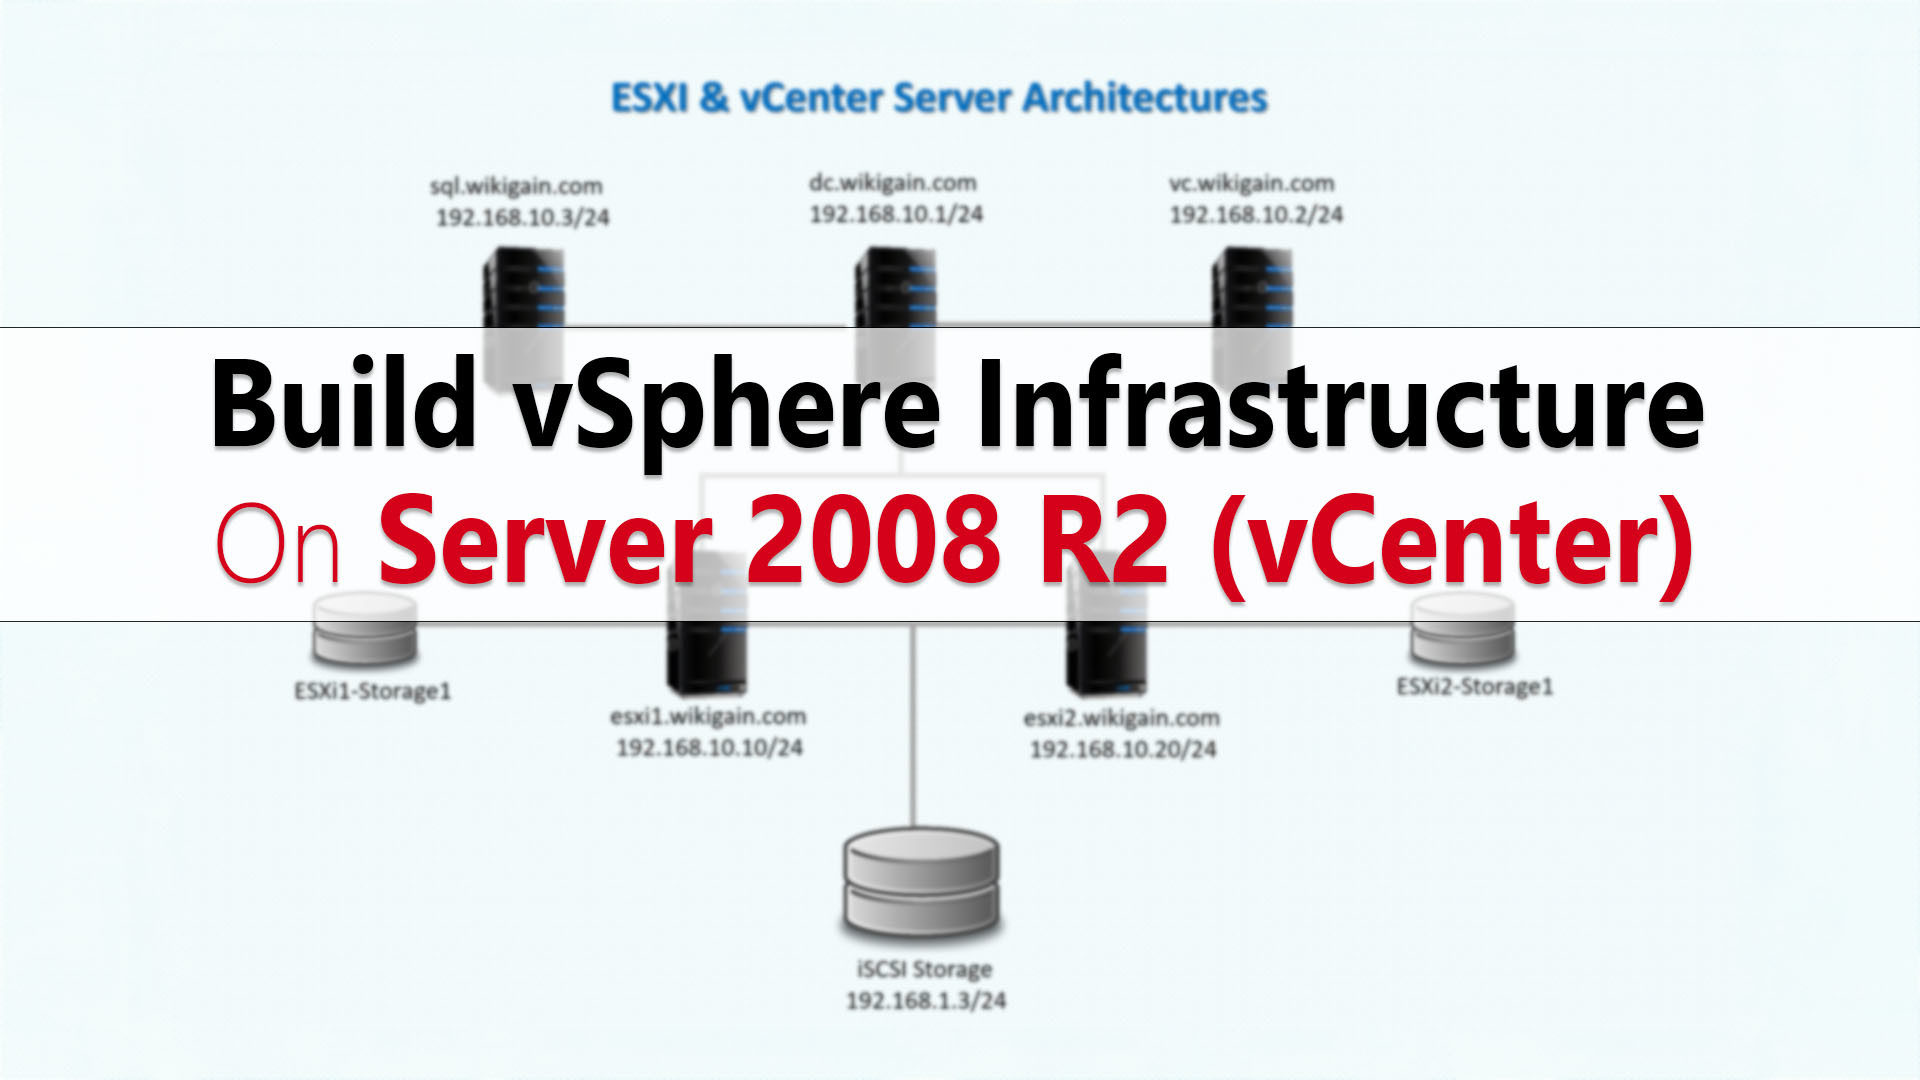 How to Build vSphere Infrastructure on Windows Server 2008 R2 vCenter Server